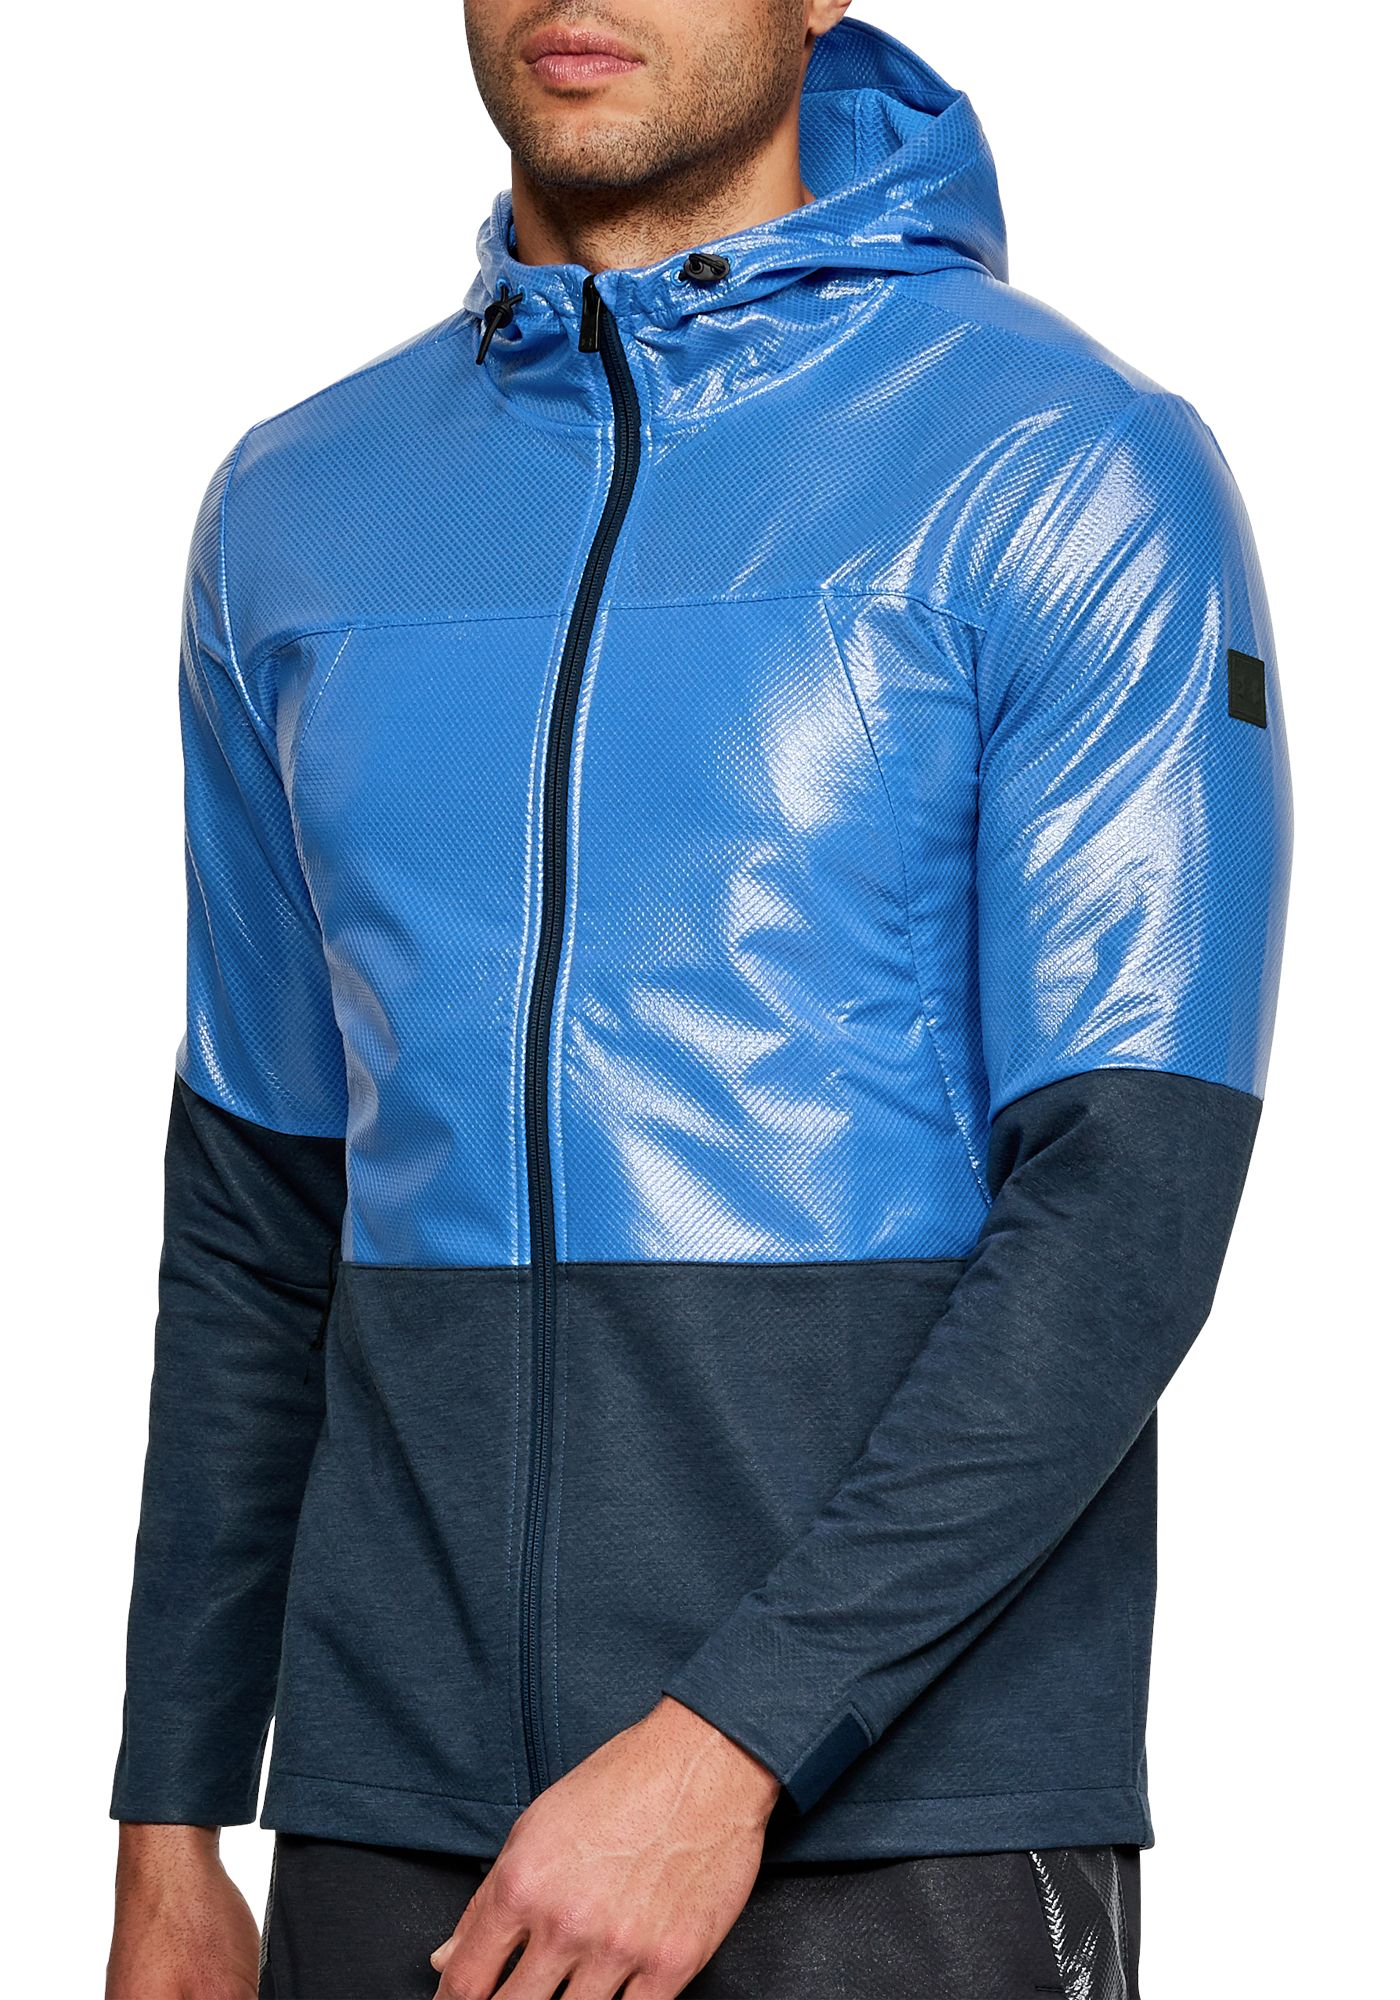 Under Armour Men's Sportstyle Elite Full-Zip Jacket